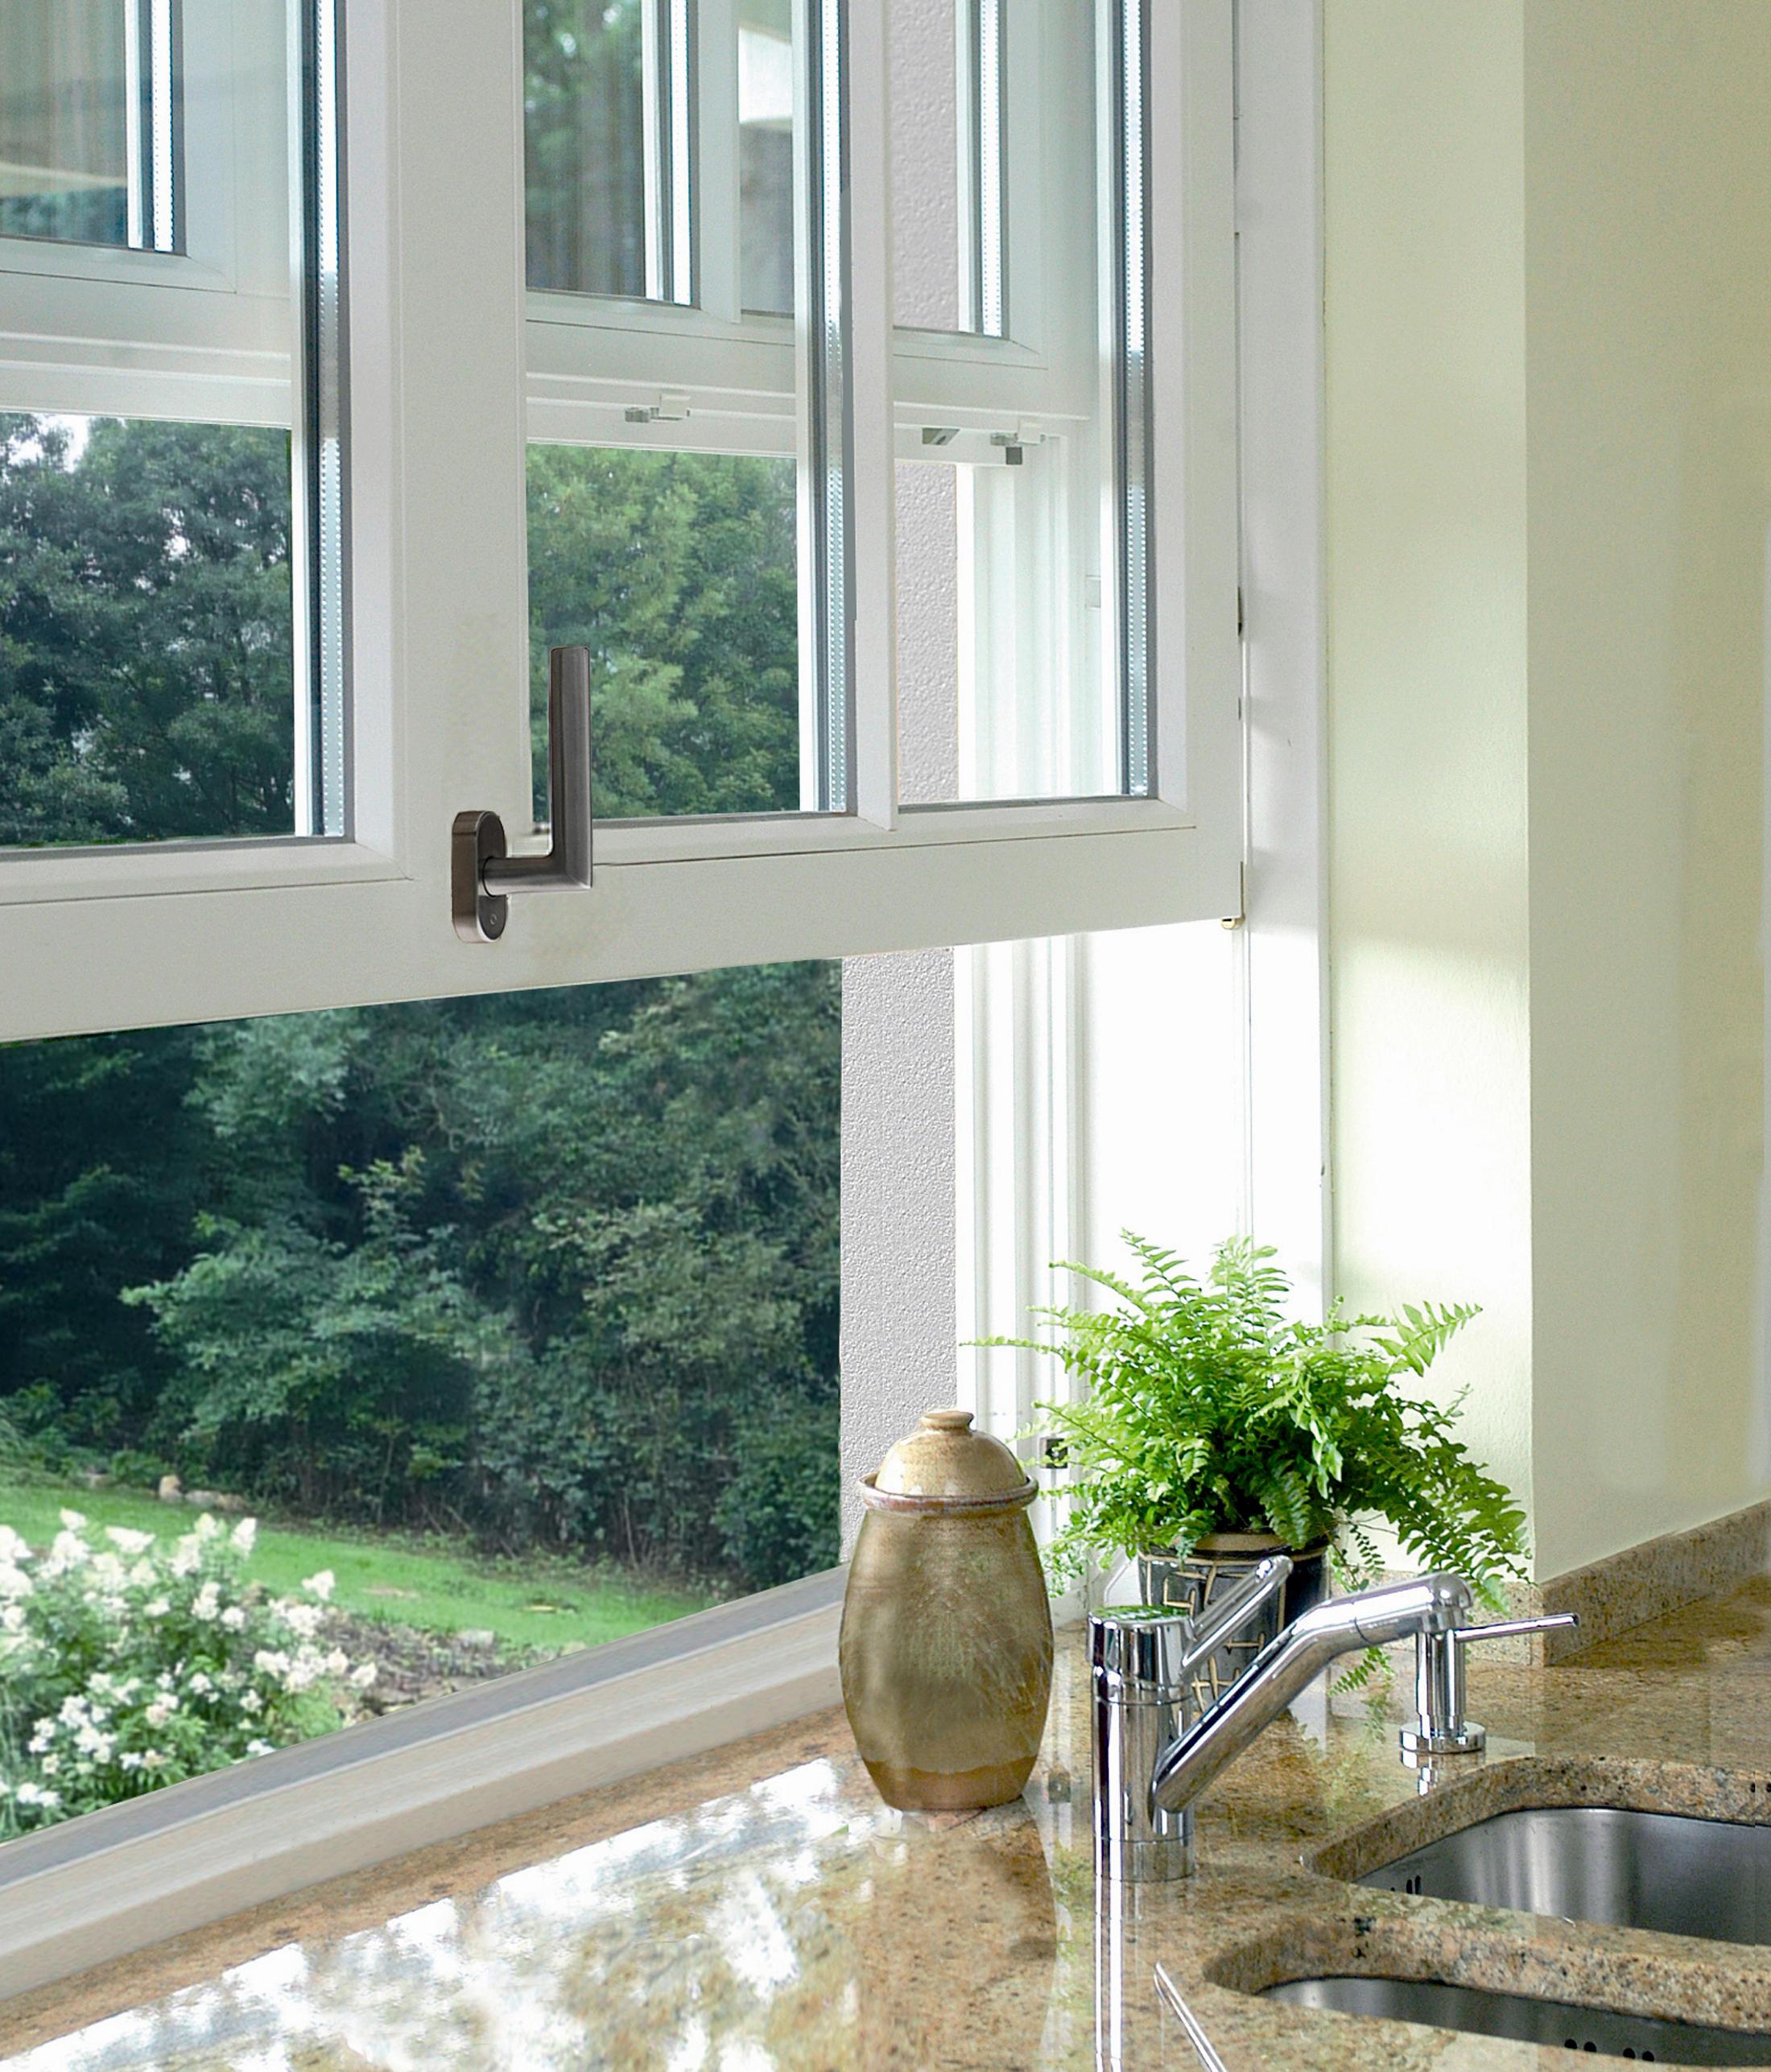 schiebefenster fenstersysteme von sorpetaler architonic. Black Bedroom Furniture Sets. Home Design Ideas